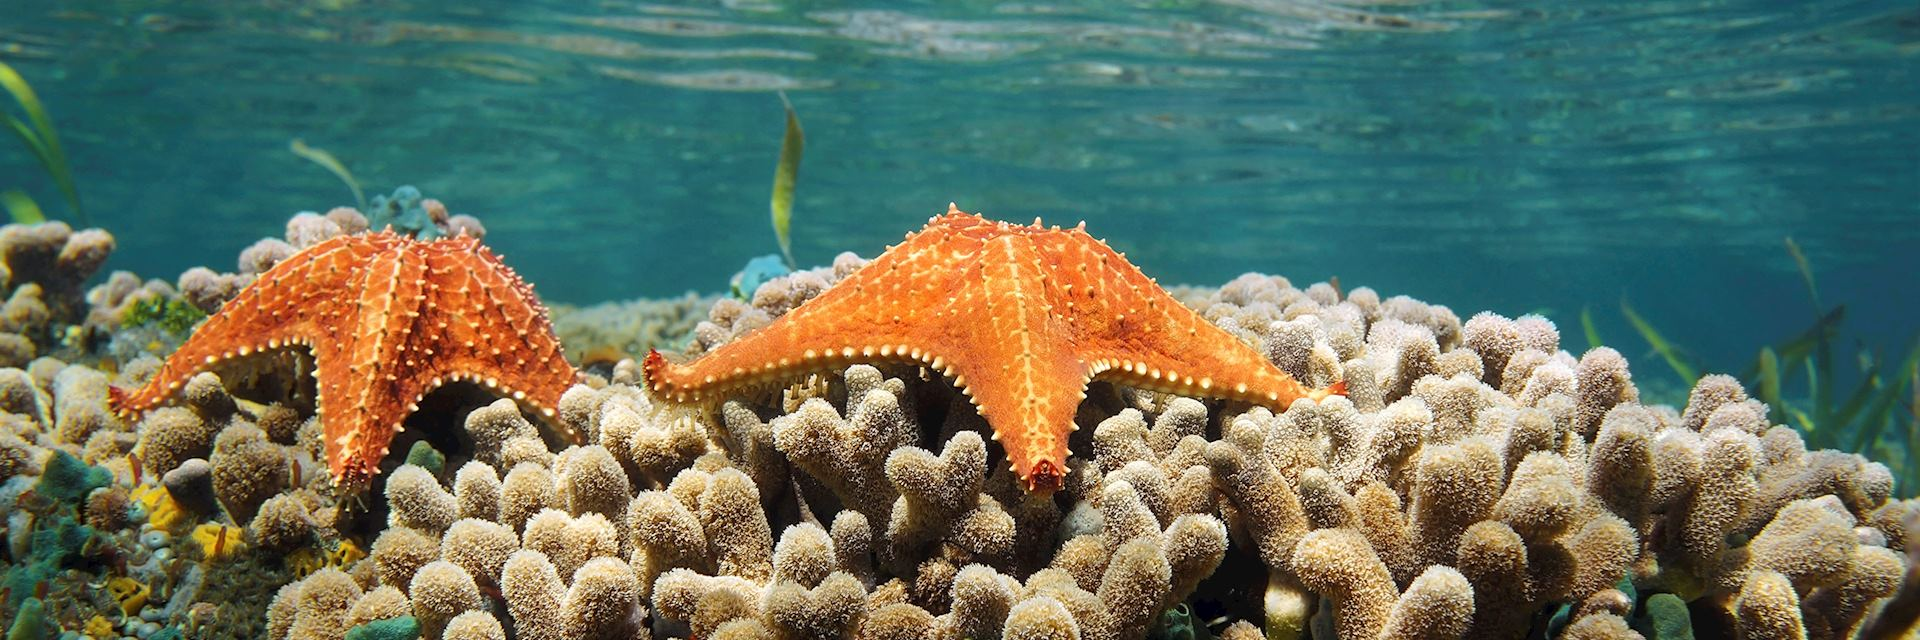 Starfish, Bocas del Toro